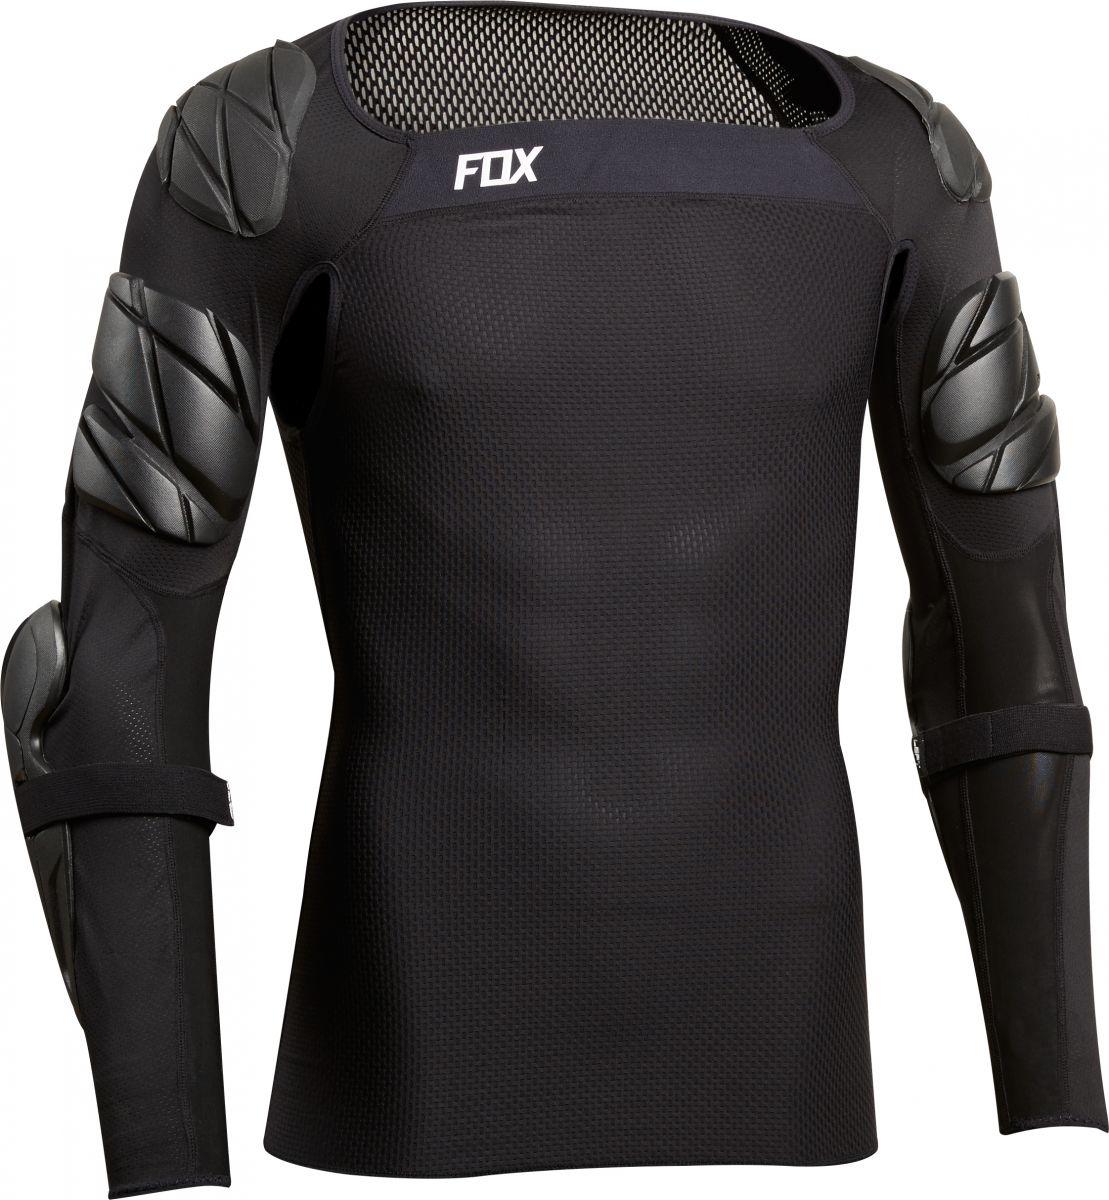 Fox - 2018 Airframe Pro Sleeve CE Black защитное джерси, черный